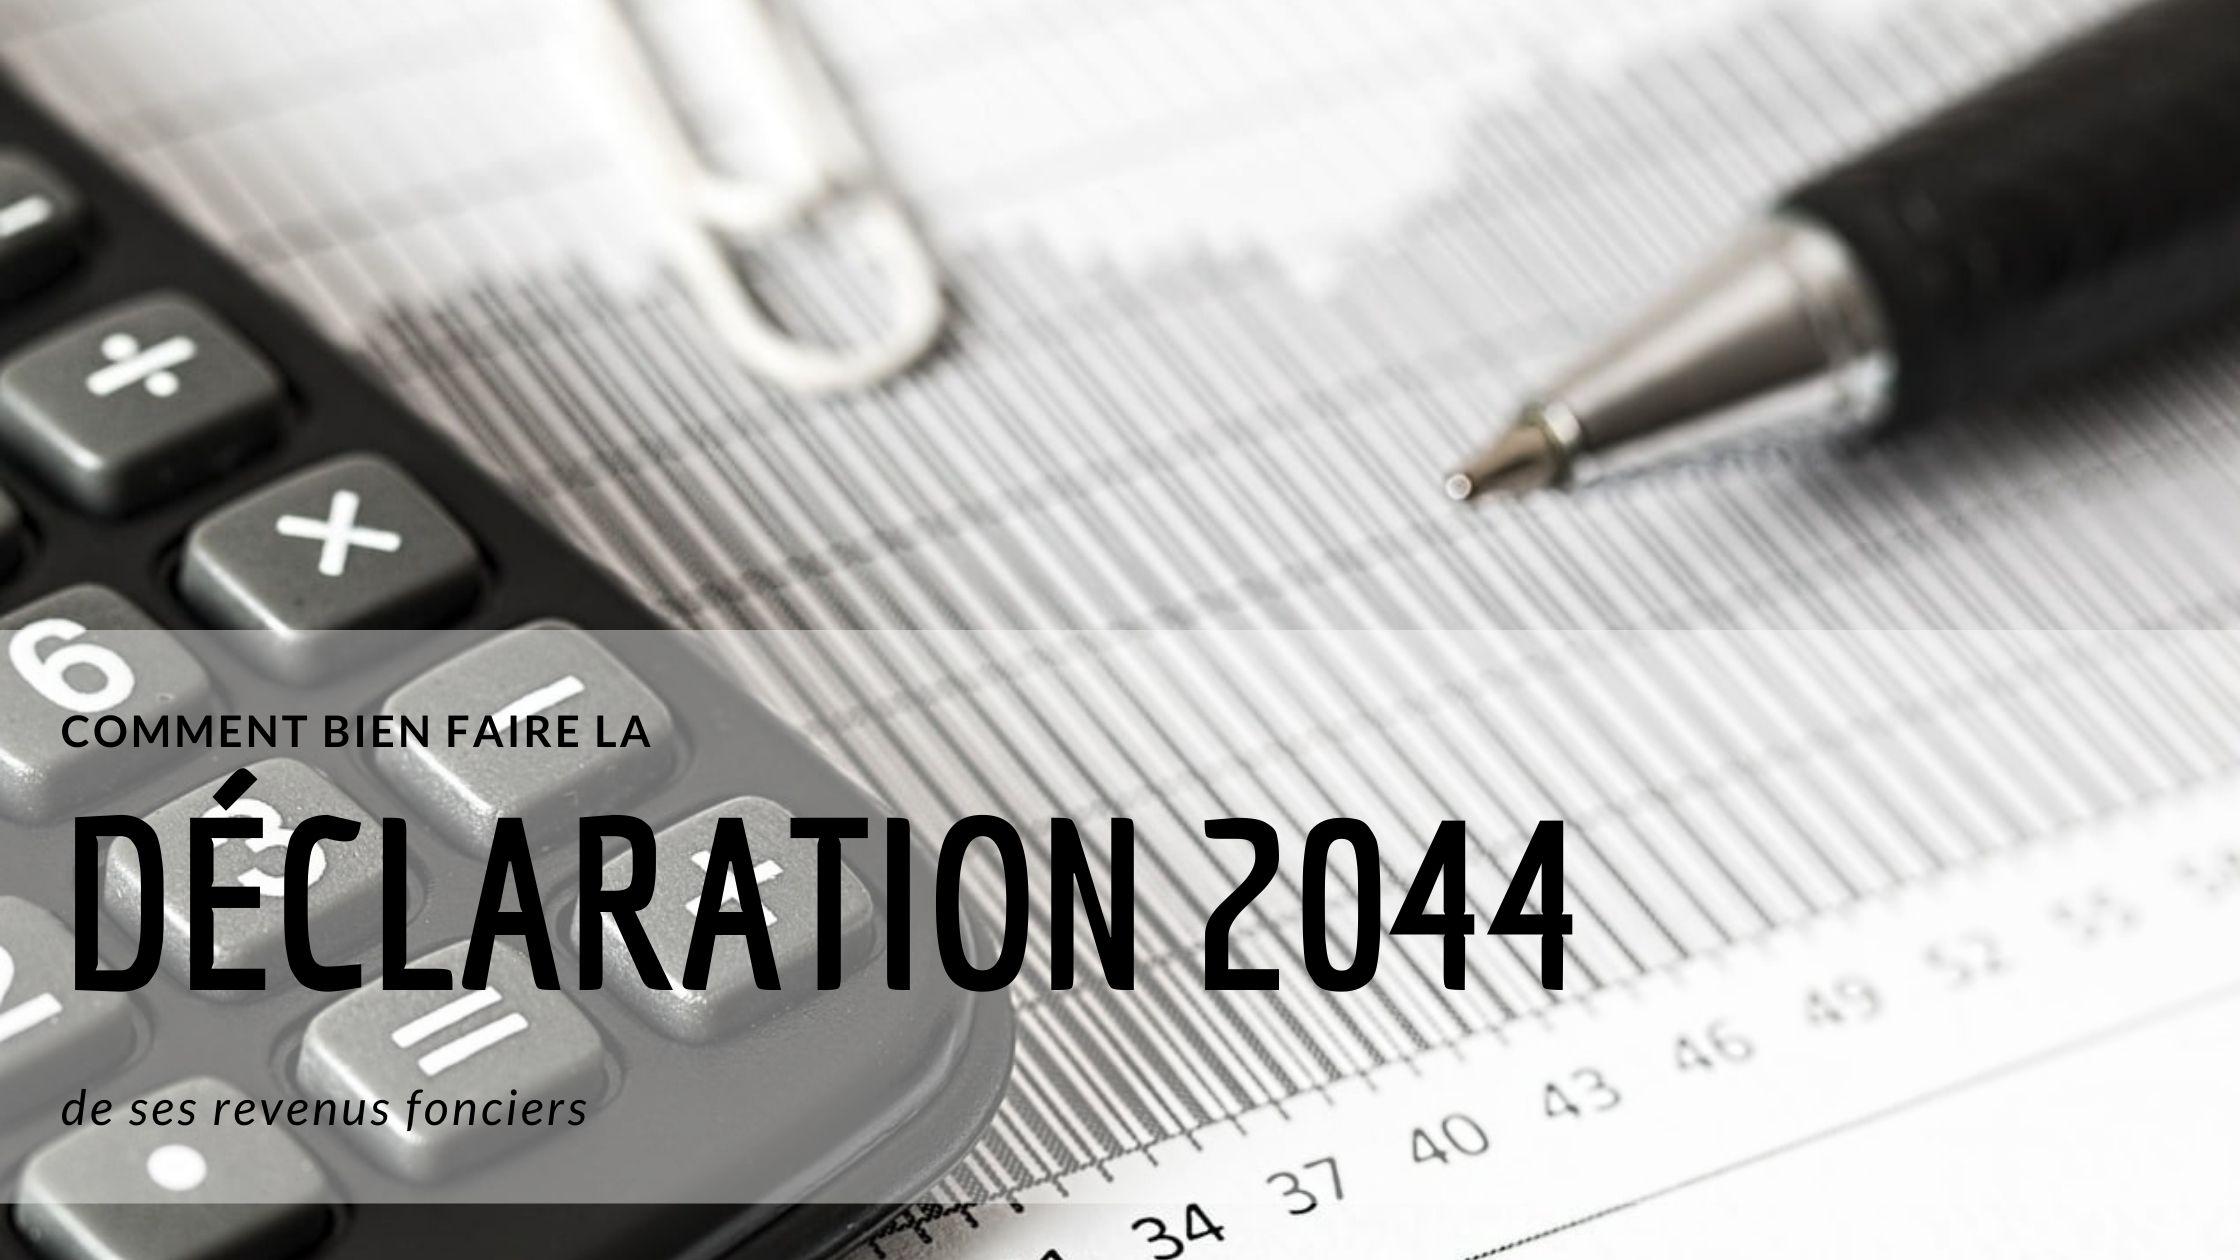 declaration 2044